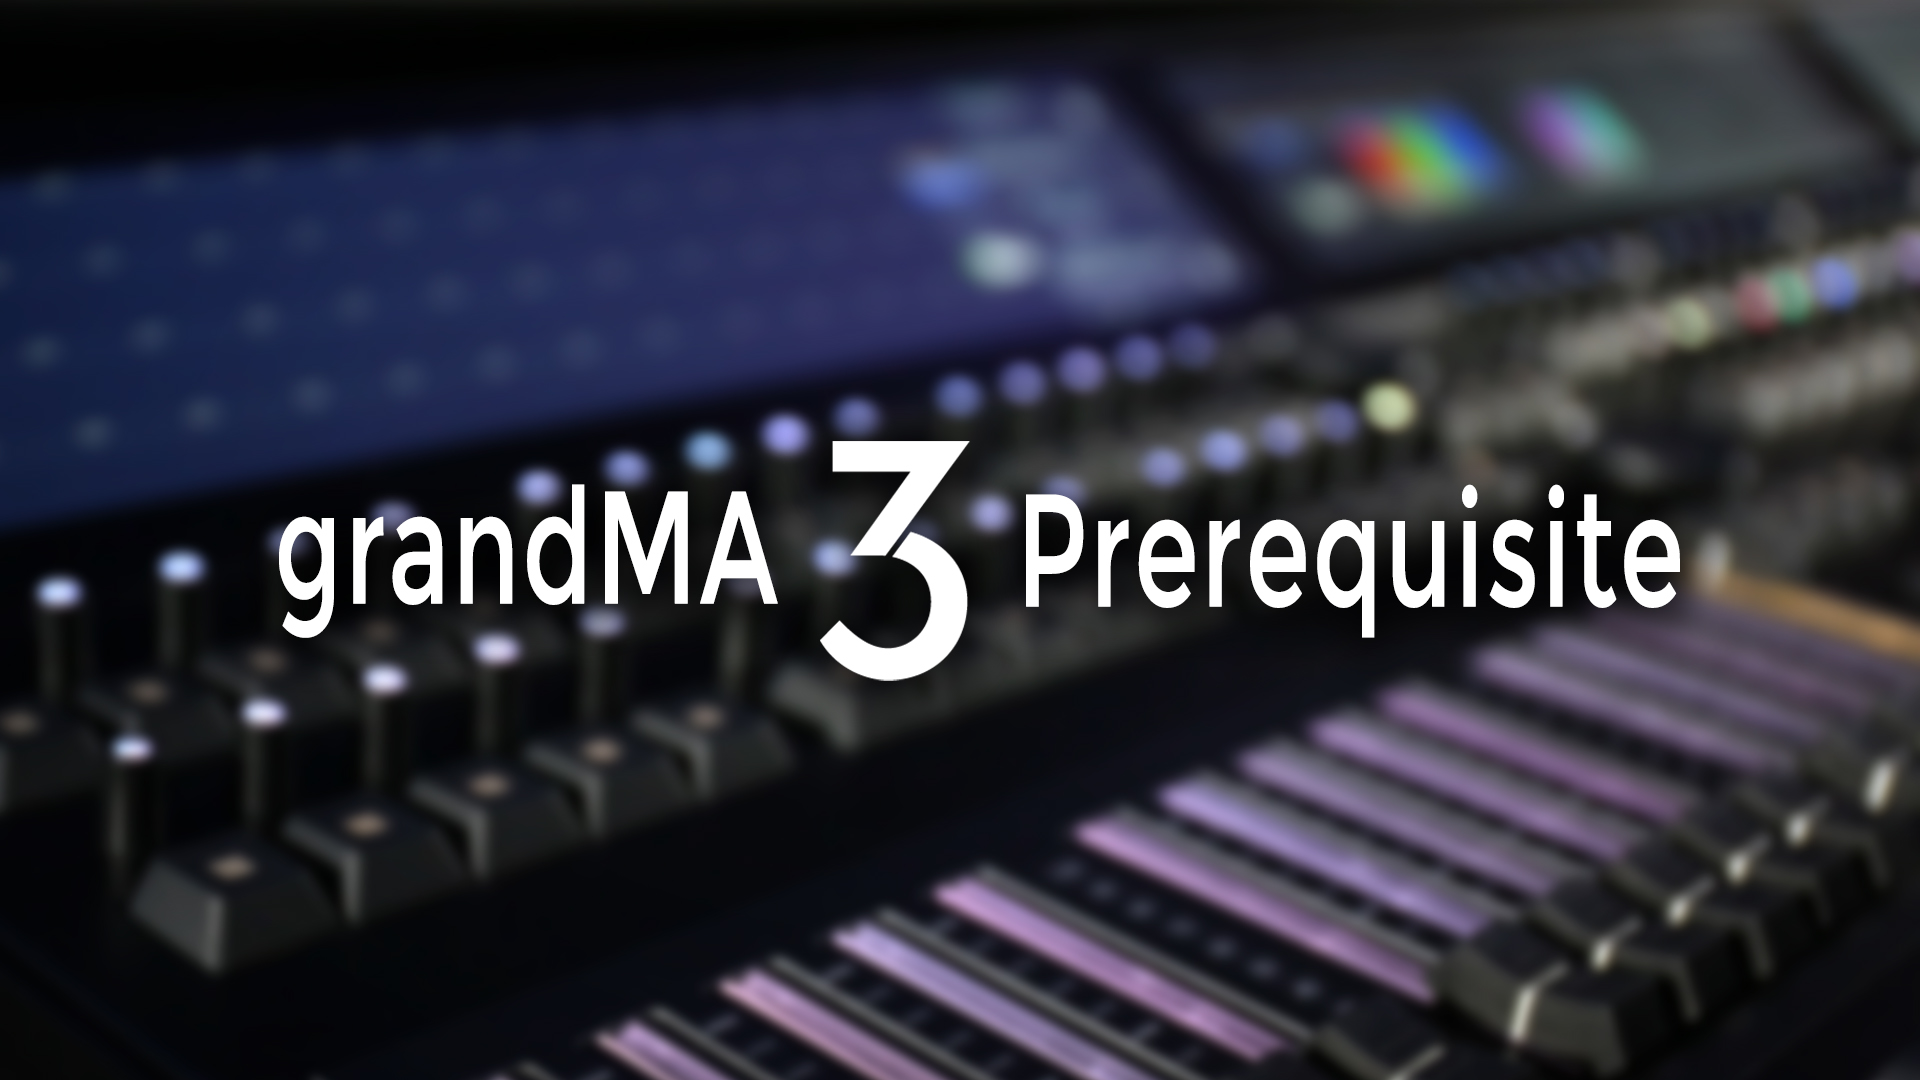 grandMA3 Prerequisite